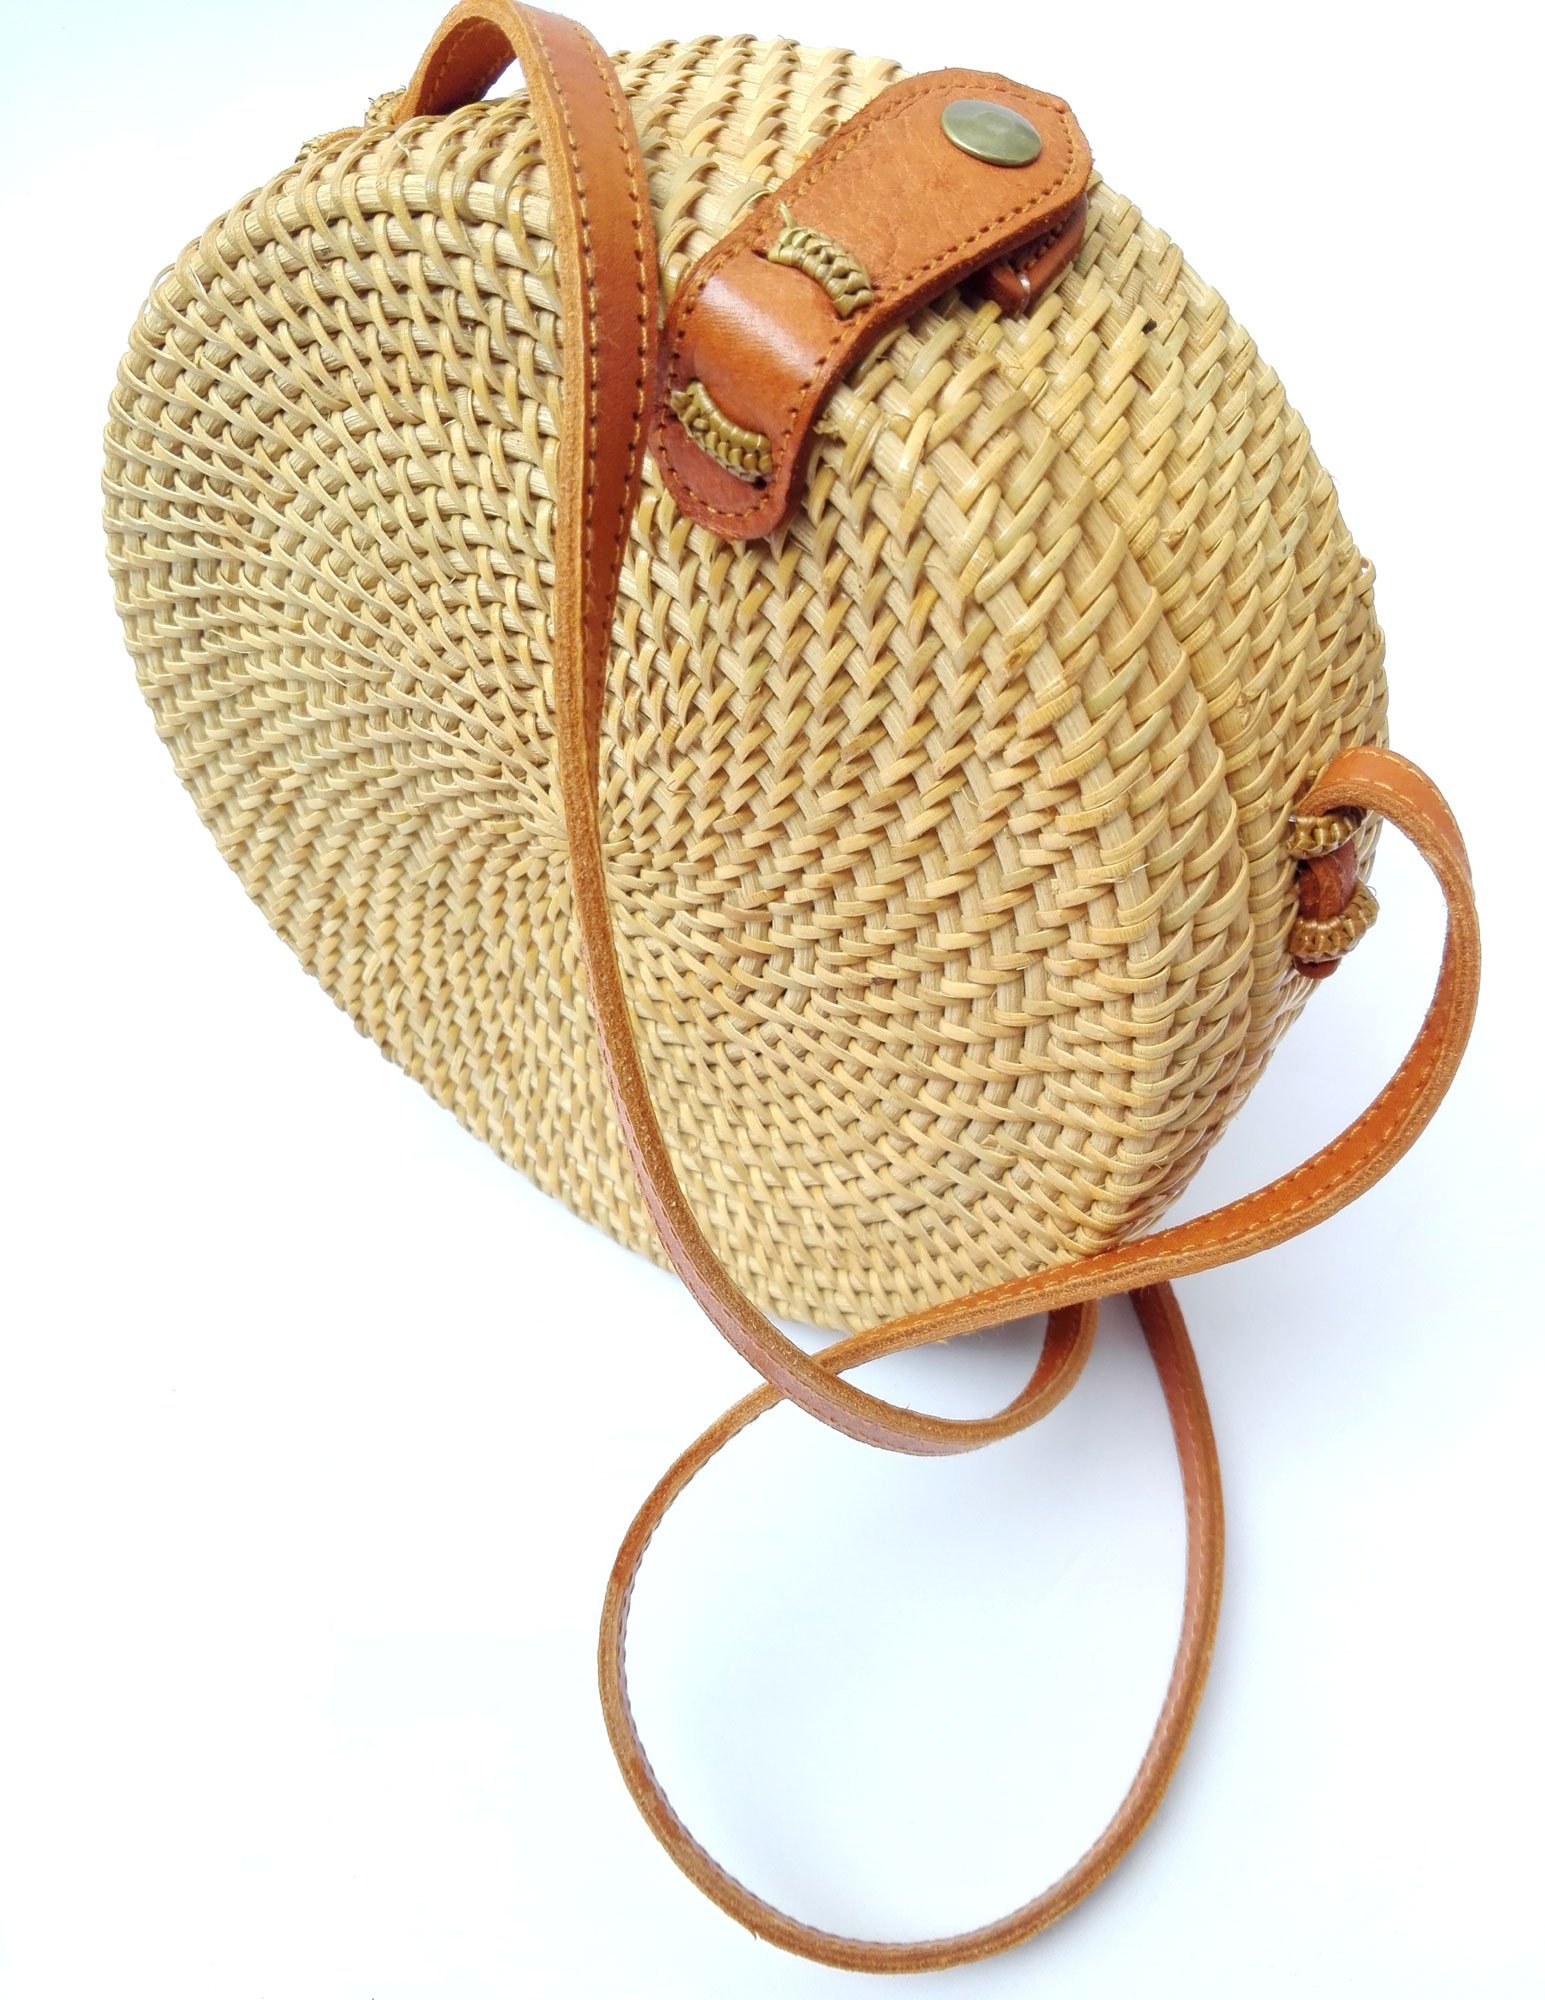 Bali Rattan - Handwoven Round Rattan Bag (Plain Weave Leather Closure) by Bali Rattan (Image #7)